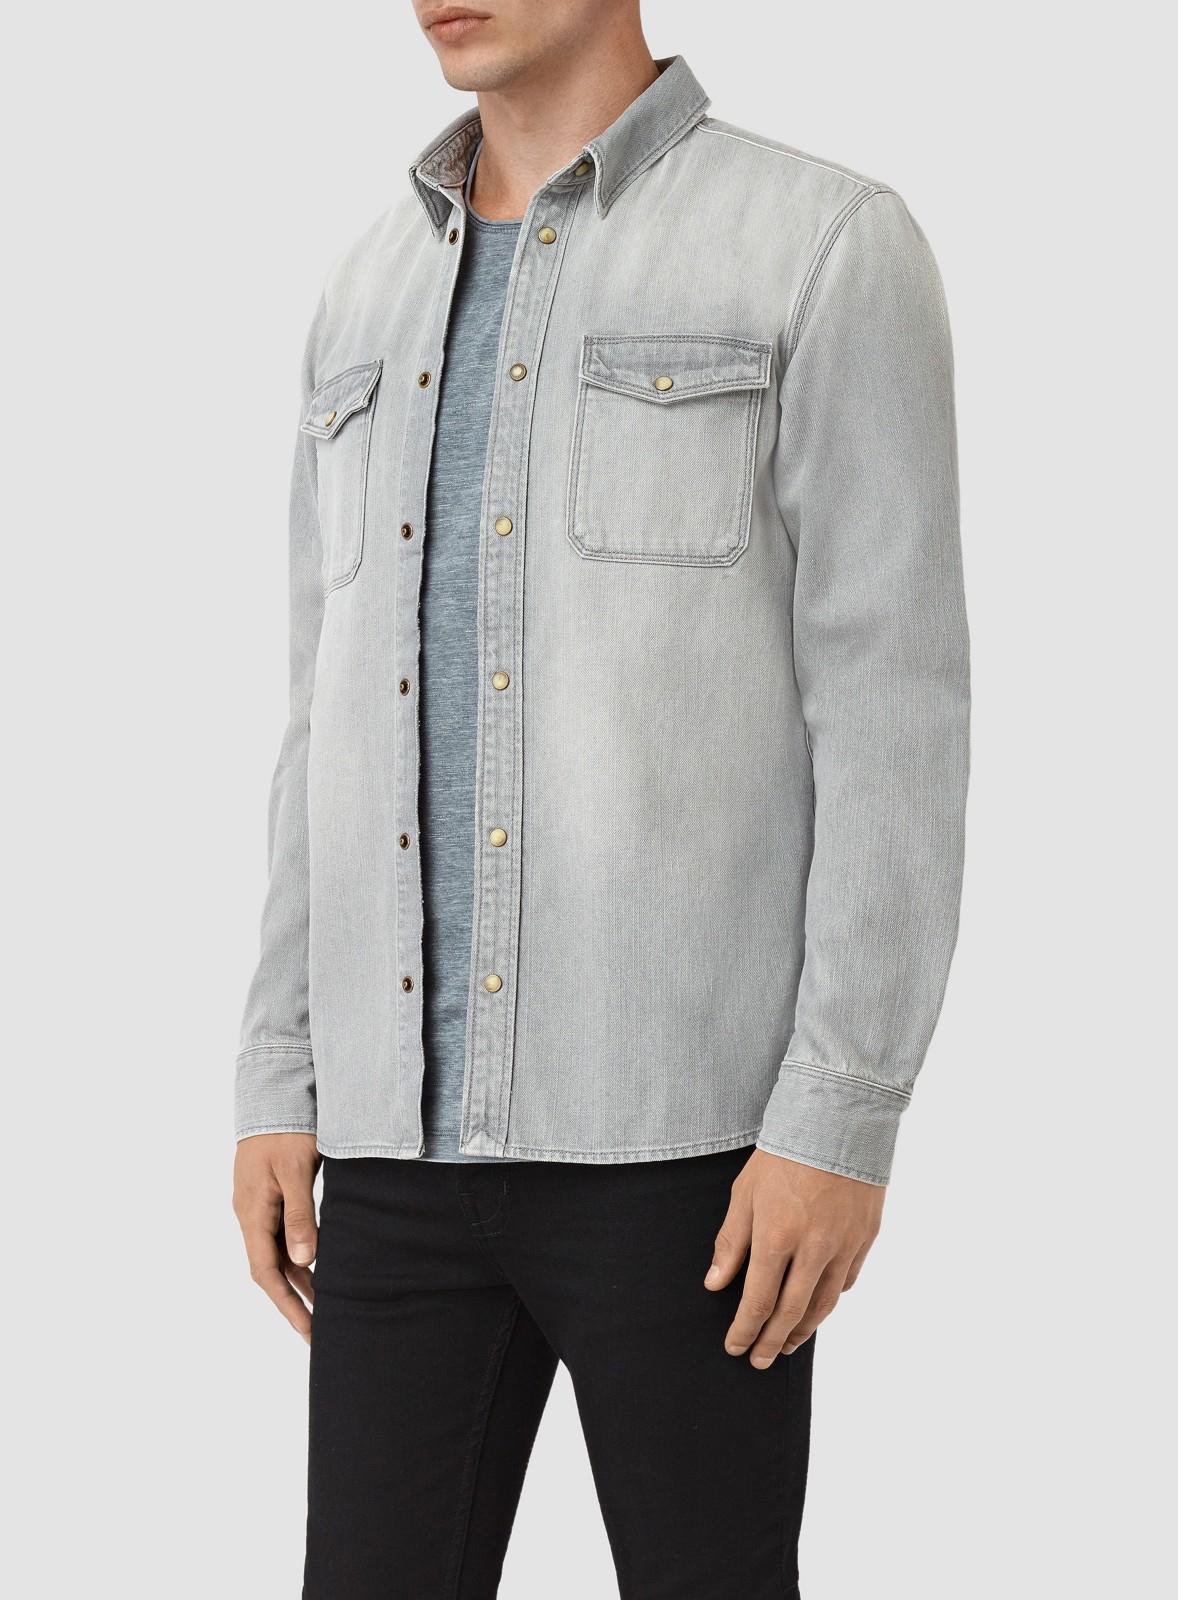 AllSaints Denim Ardno Shirt in Grey (Grey) for Men